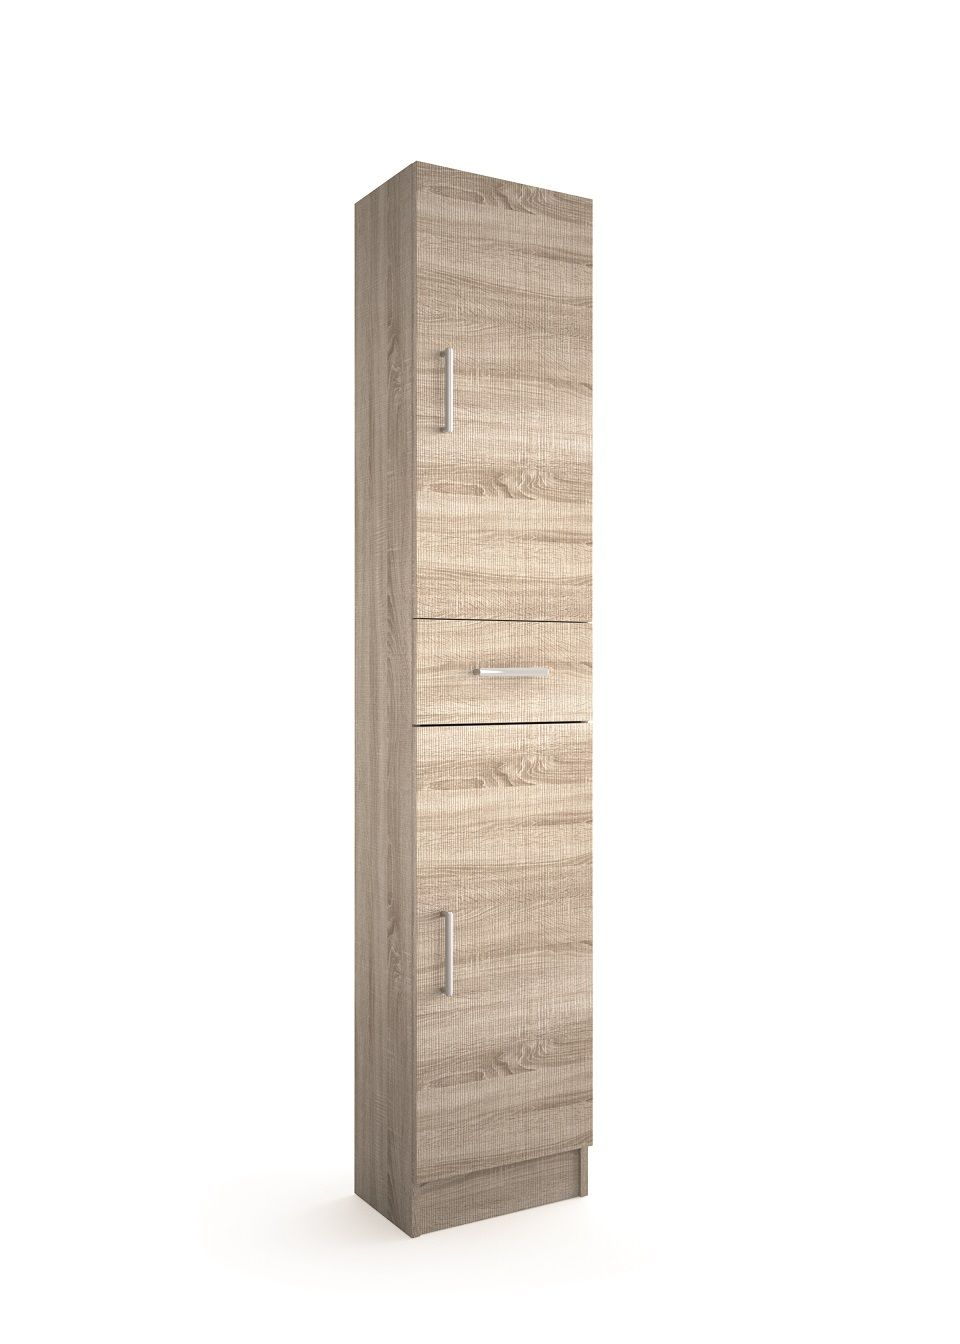 Muebles Auxi hoge opbergkast caledonia 180x36x24cm 2 deuren 1 lade